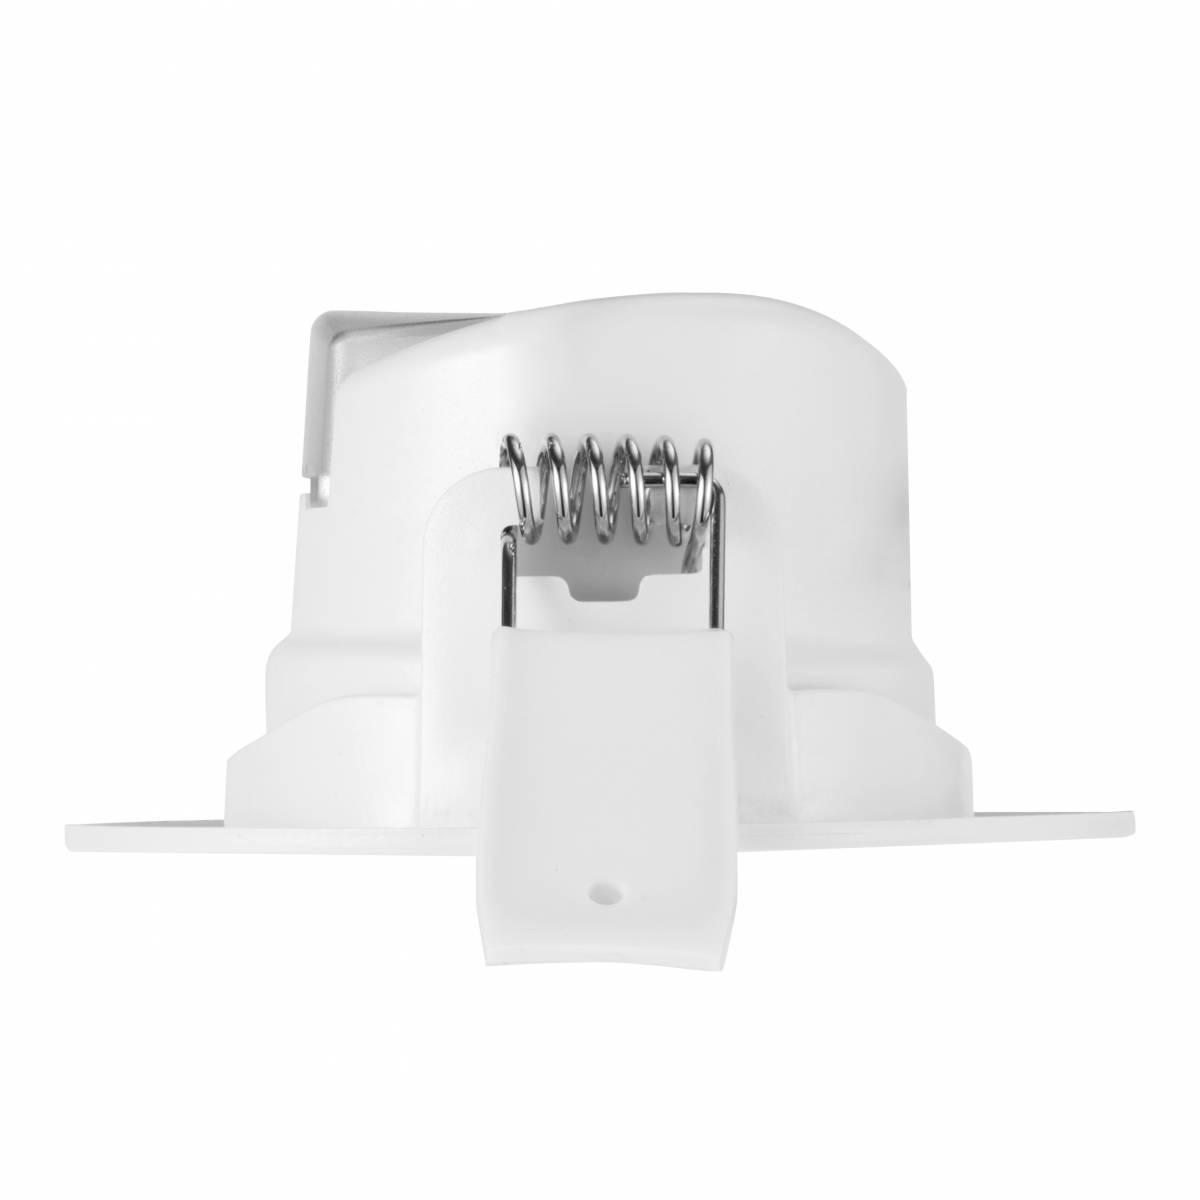 Piko LED 6,5W 550lm 3000K 230V 40° white